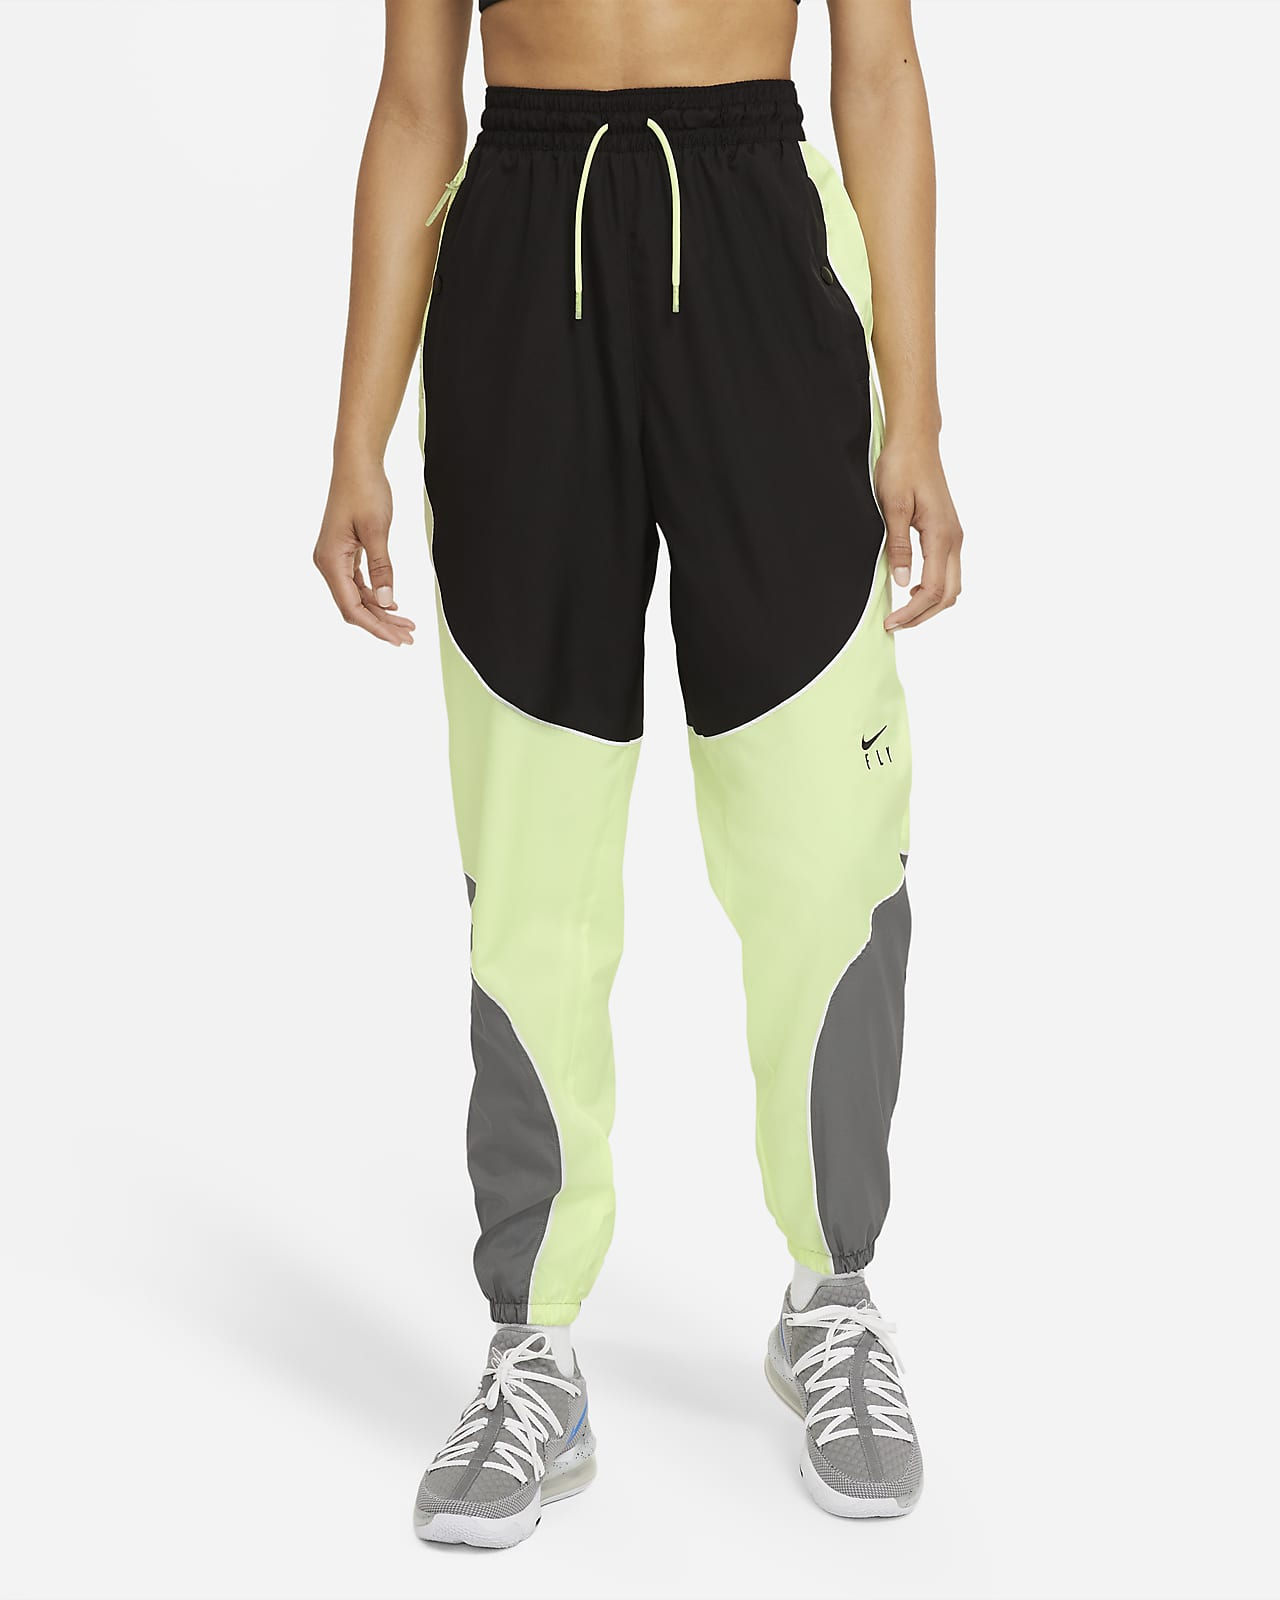 Pantalon de basketball Nike Swoosh Fly pour Femme